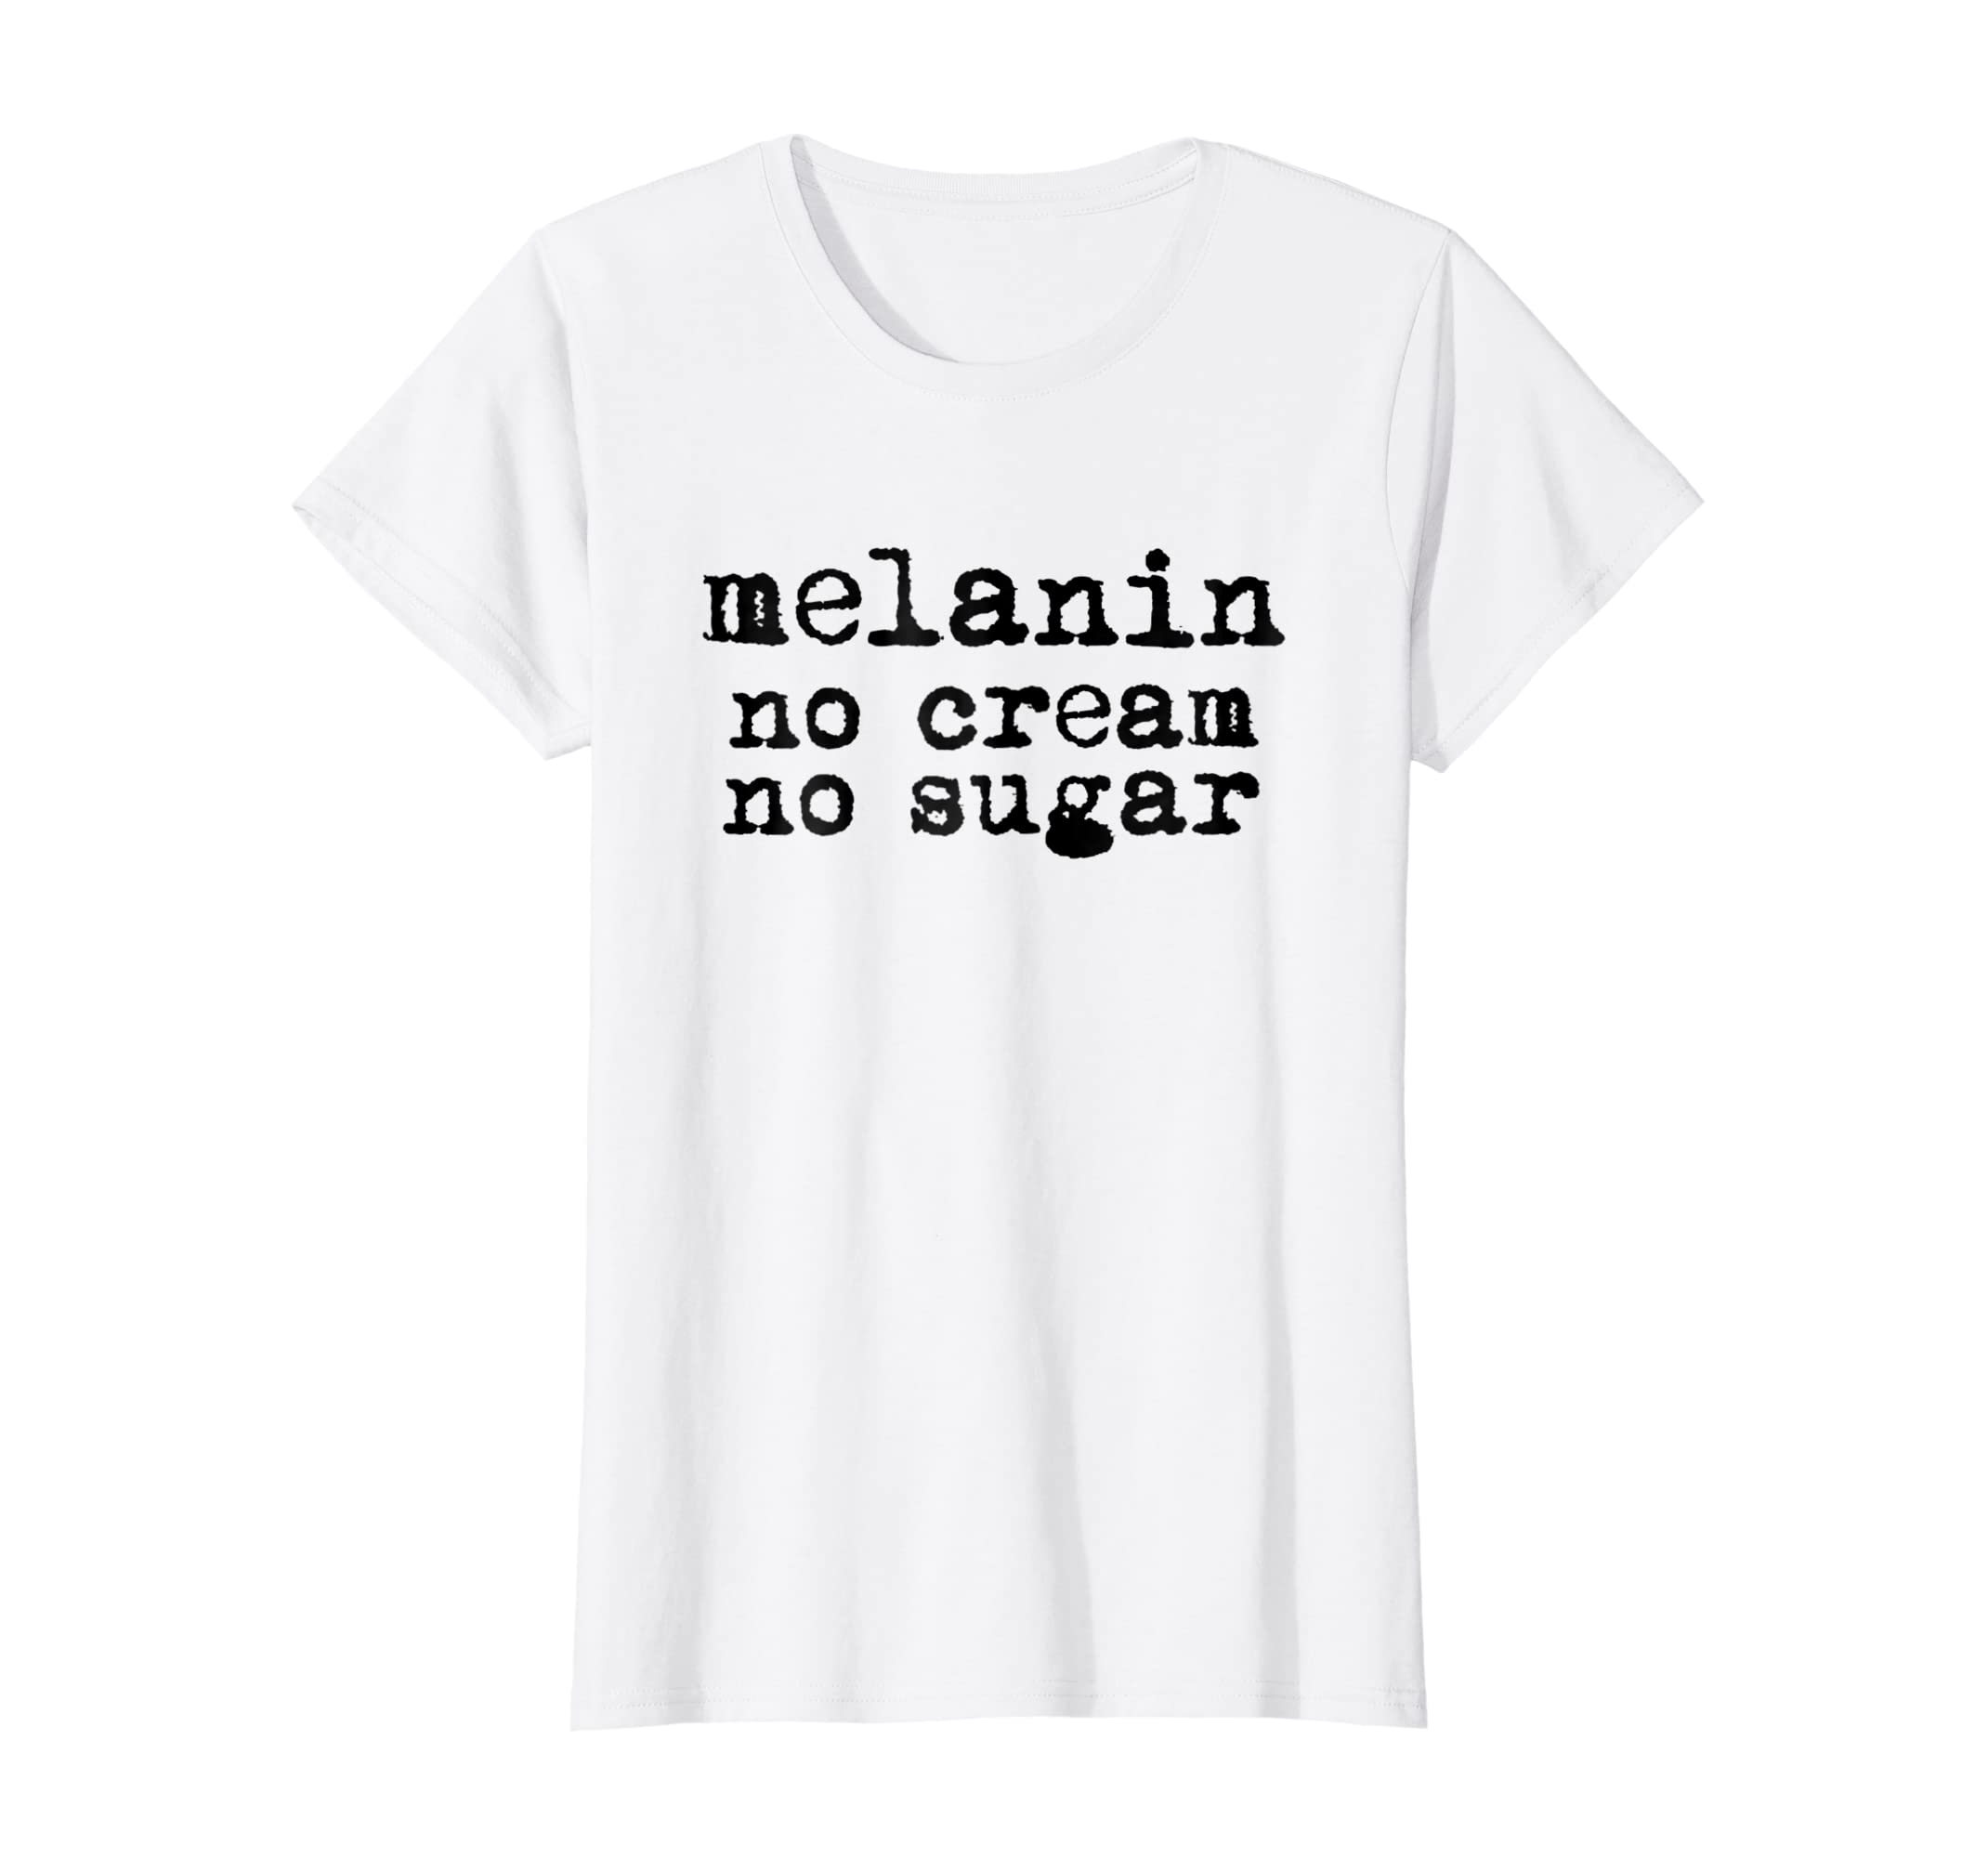 c6d196bd7 Amazon.com: Womens melanin no cream no sugar vintage style gift White T  shirt: Clothing